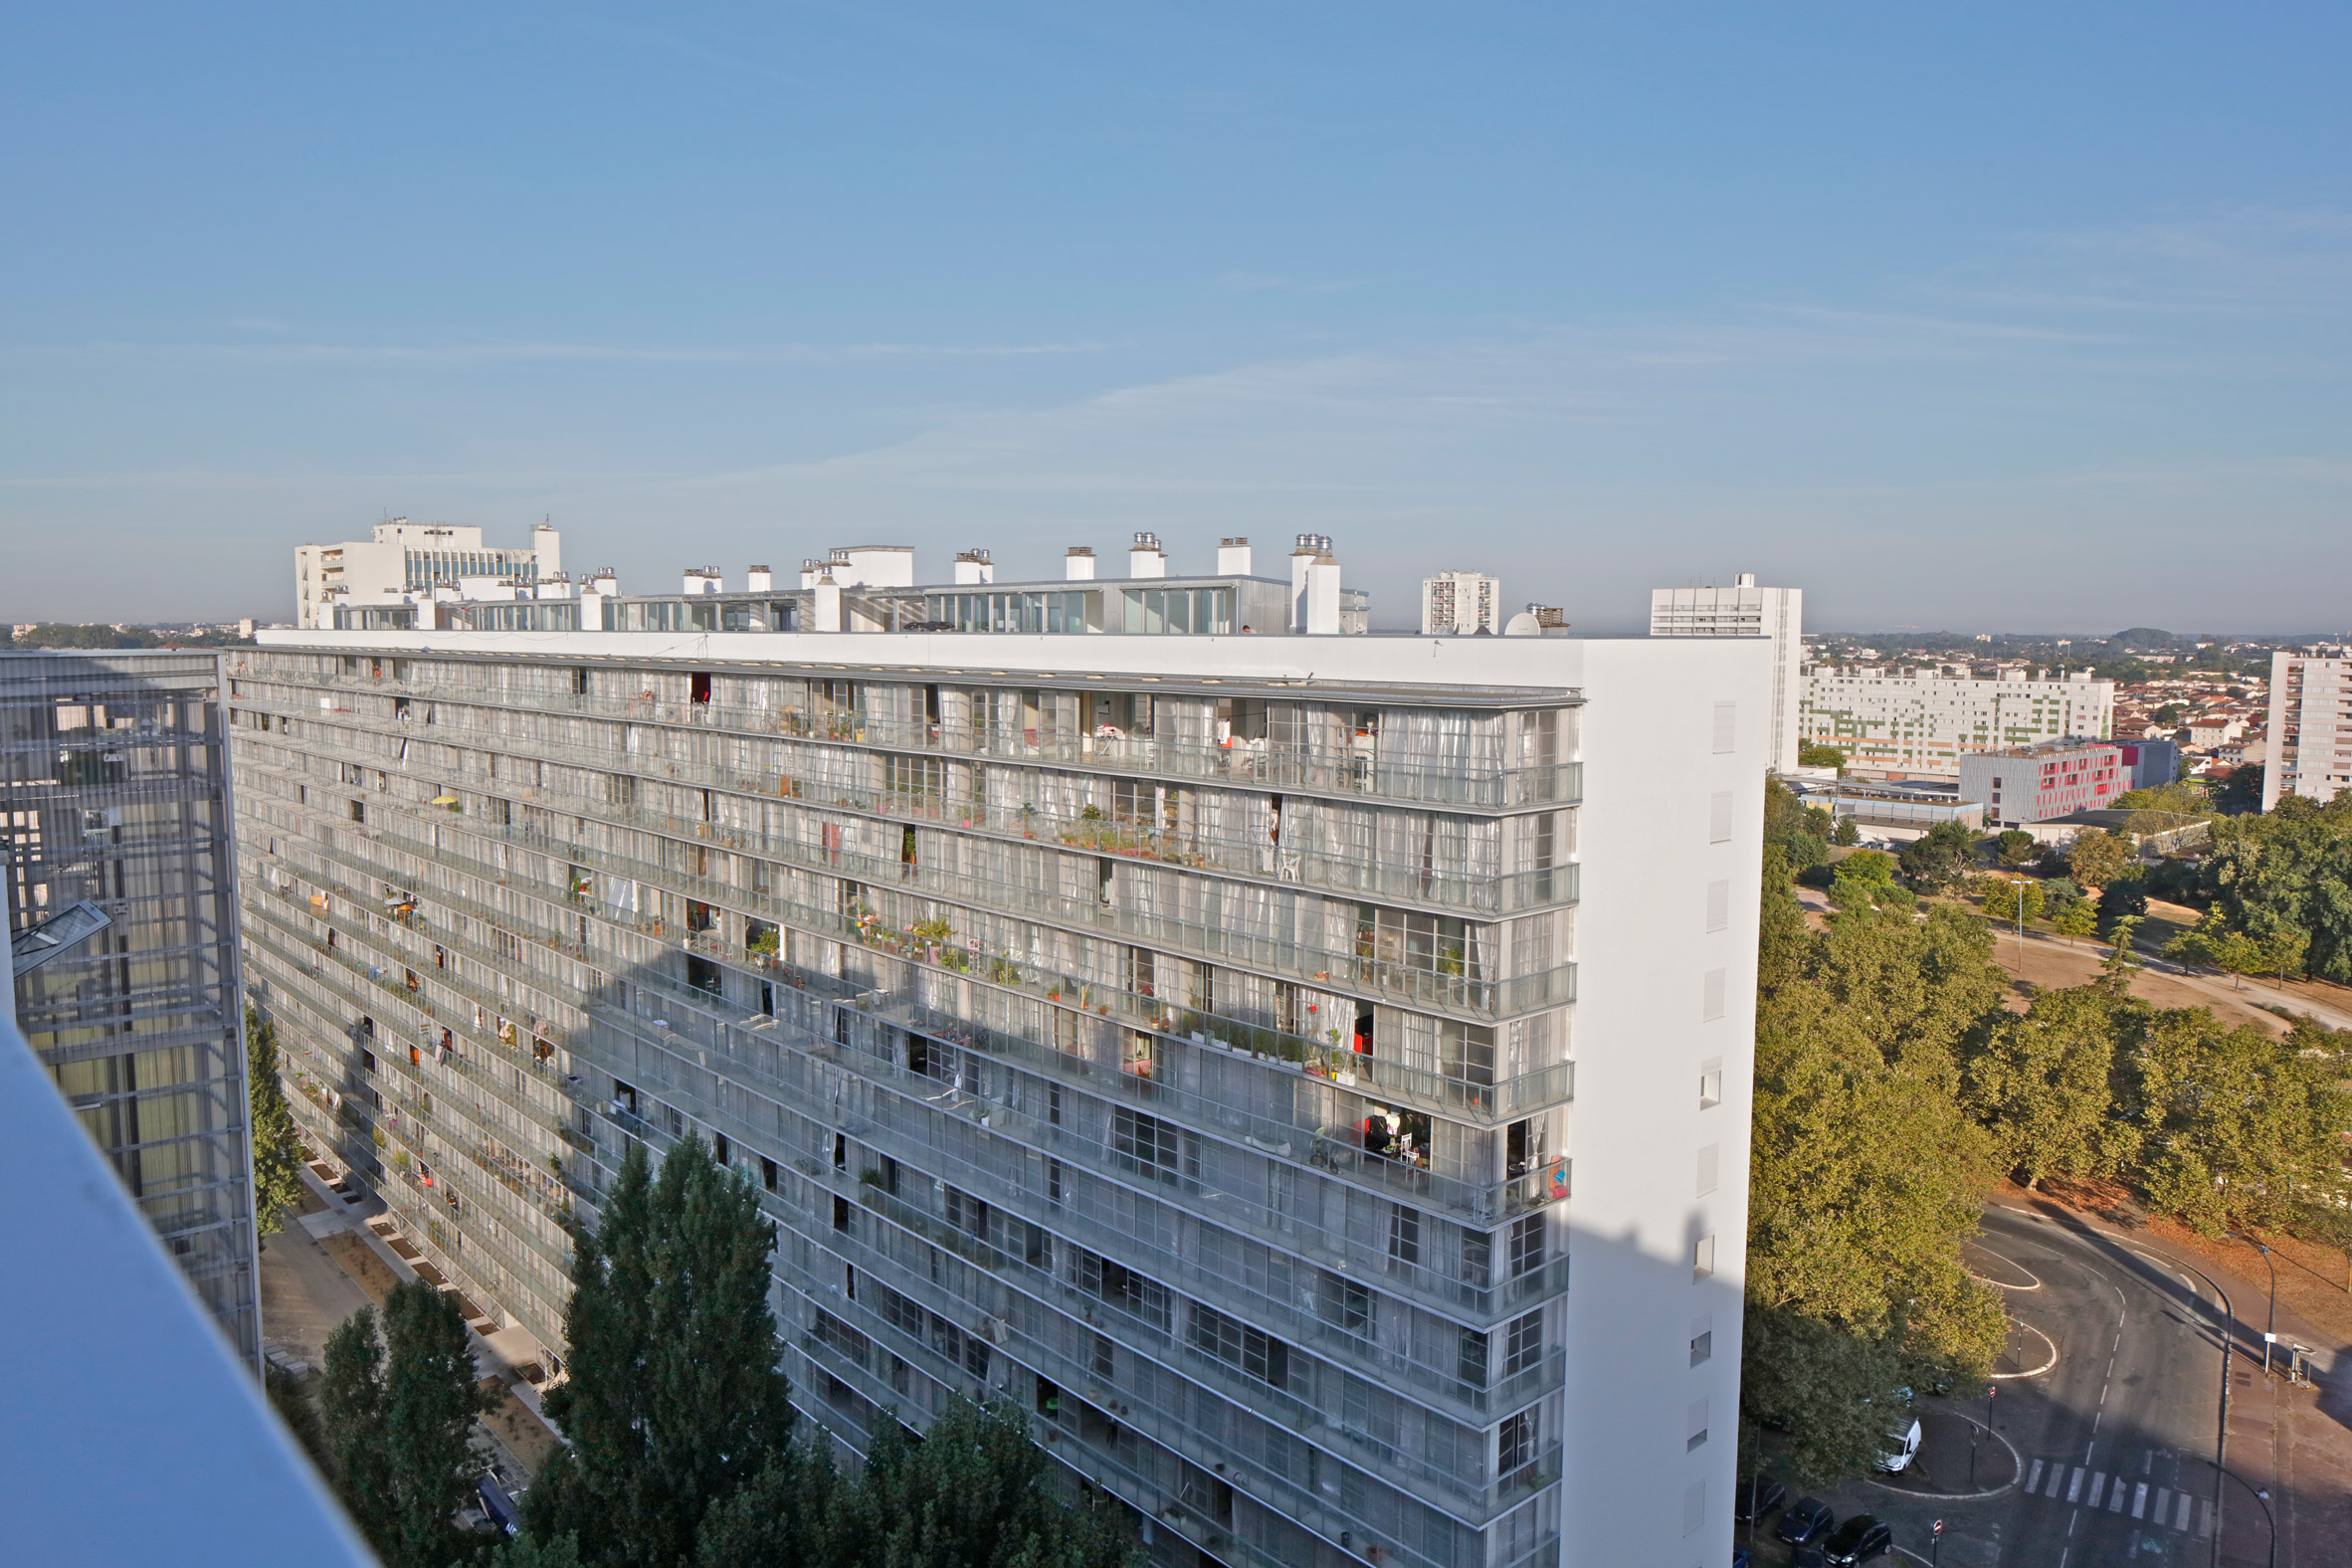 Frédéric-Druot-Architecture-Lacaton-Vassal-Architectes-Christophe-Hutin-Architecture-transformation-of-530-dwellings-mies-van-der-rohe-award-2019-winner-_dezeen_2364_col_9